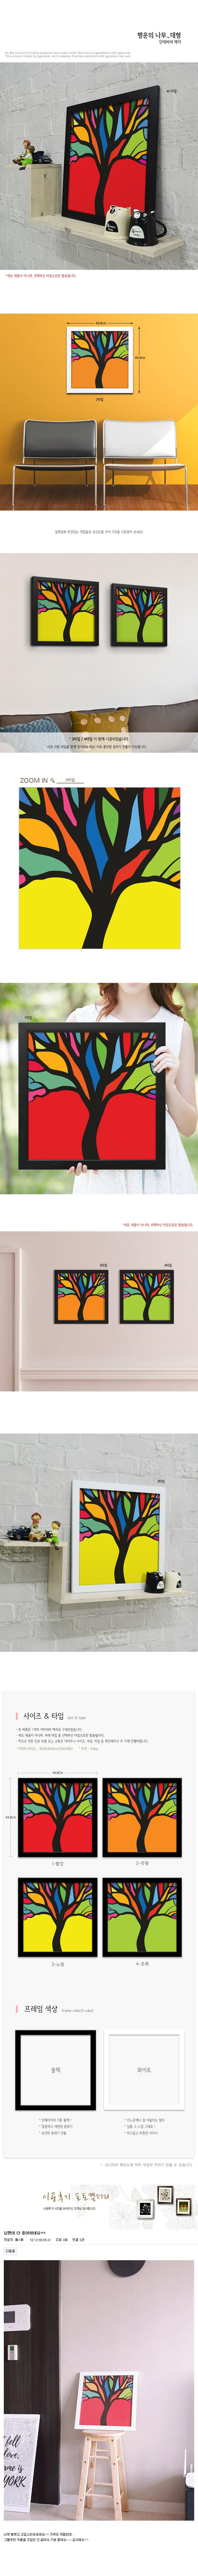 cu392-행운의나무_대형인테리어액자 - 꾸밈, 19,200원, 홈갤러리, 사진아트